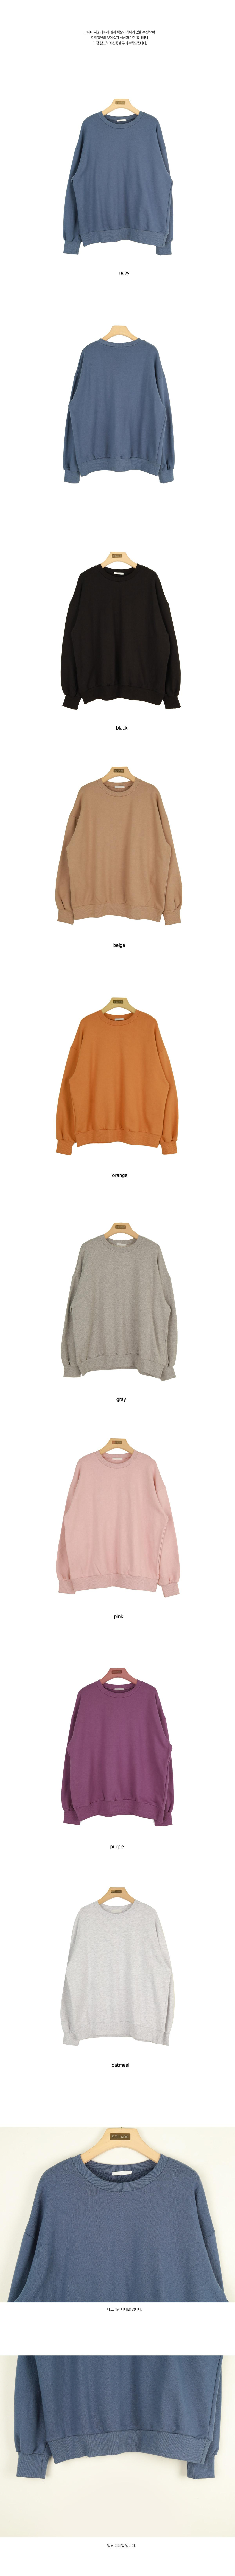 Jelly Cotton Sweatshirt